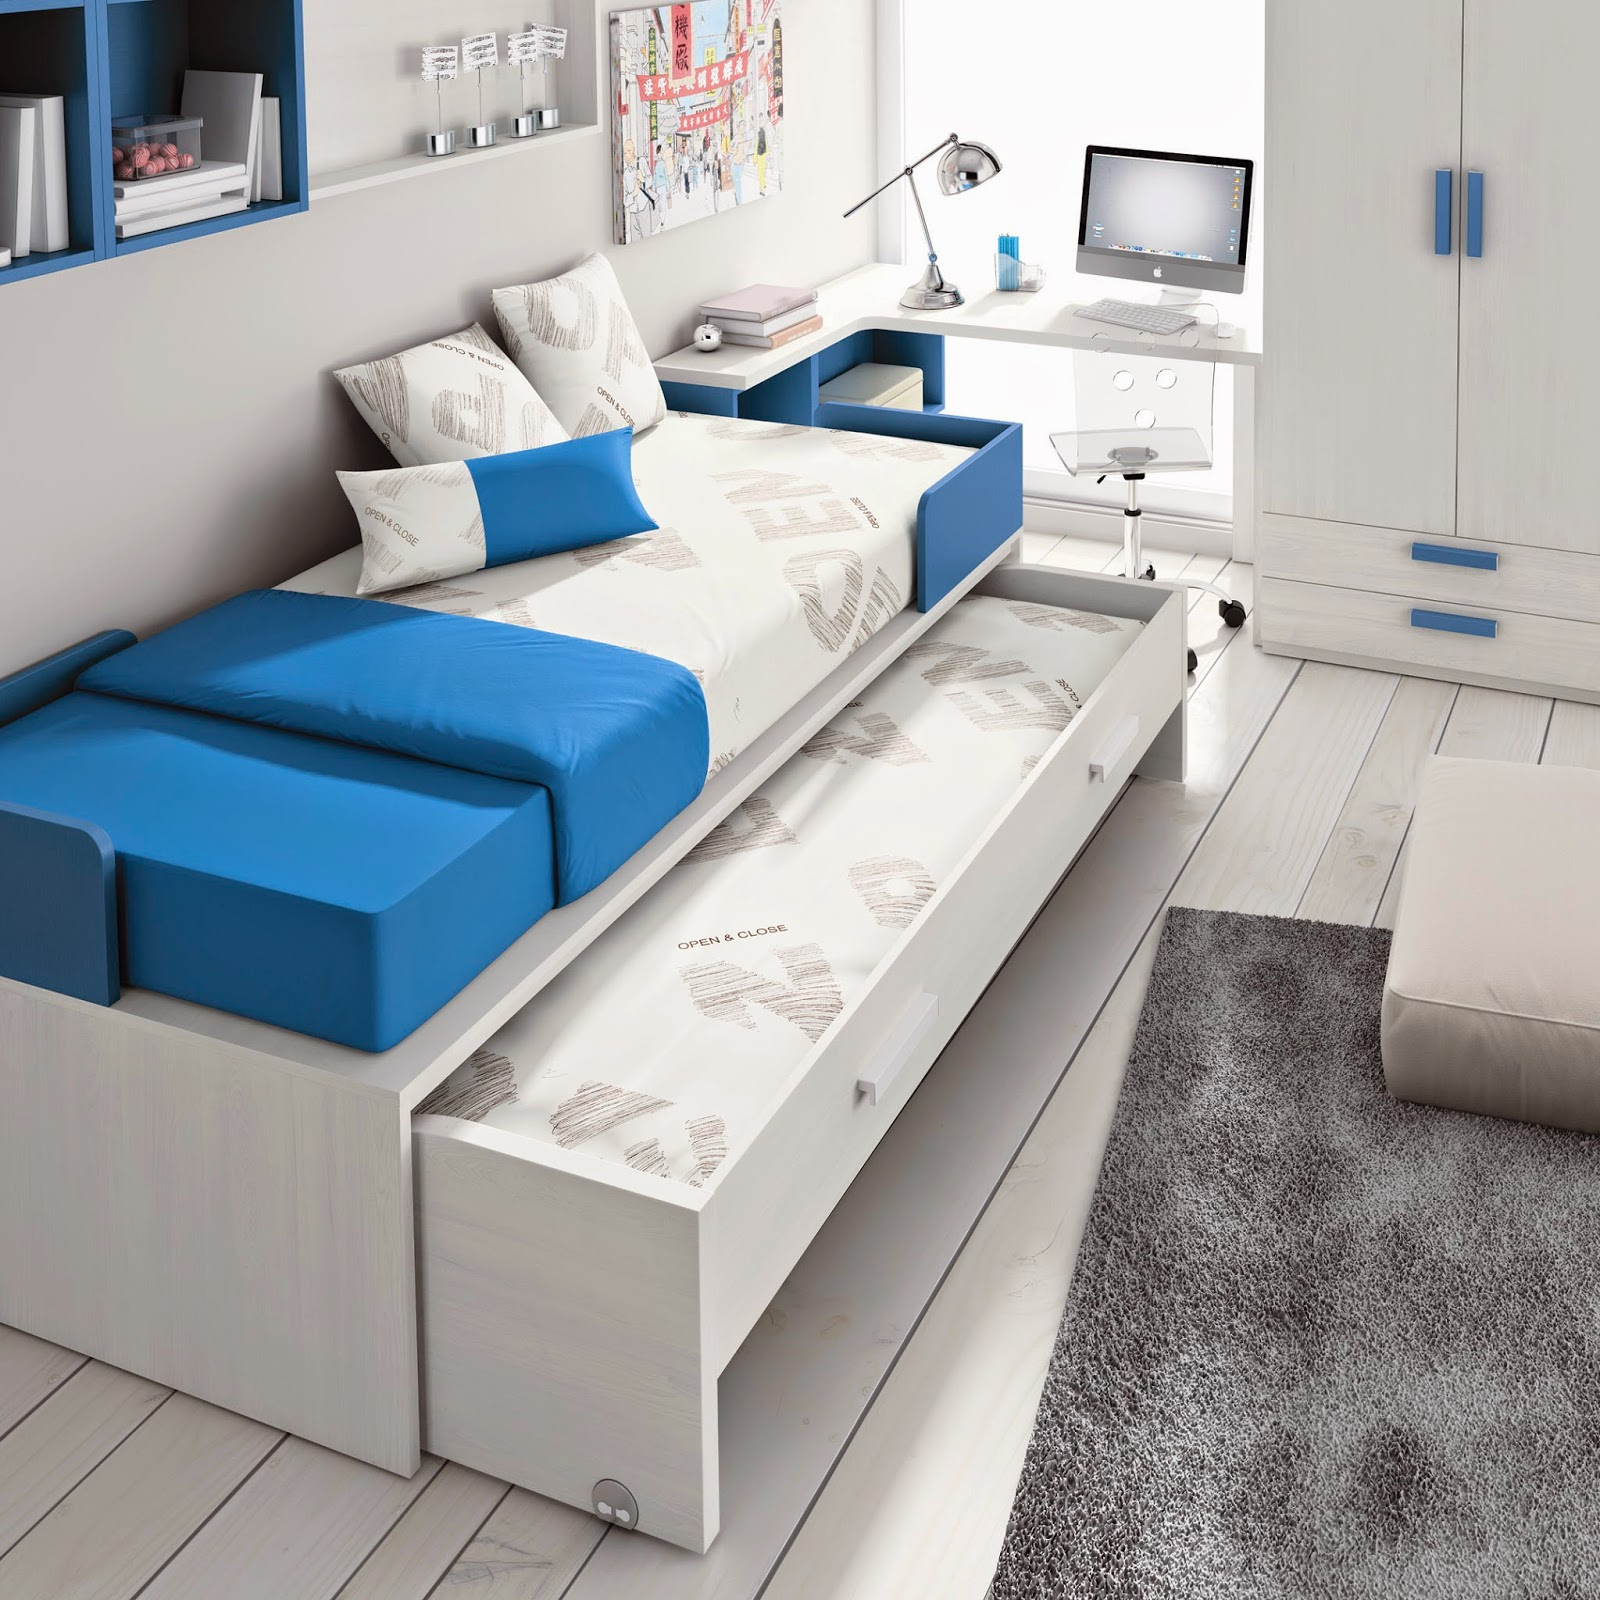 Camas nido muebles ros ahorrar espacio for Cama nido dos camas